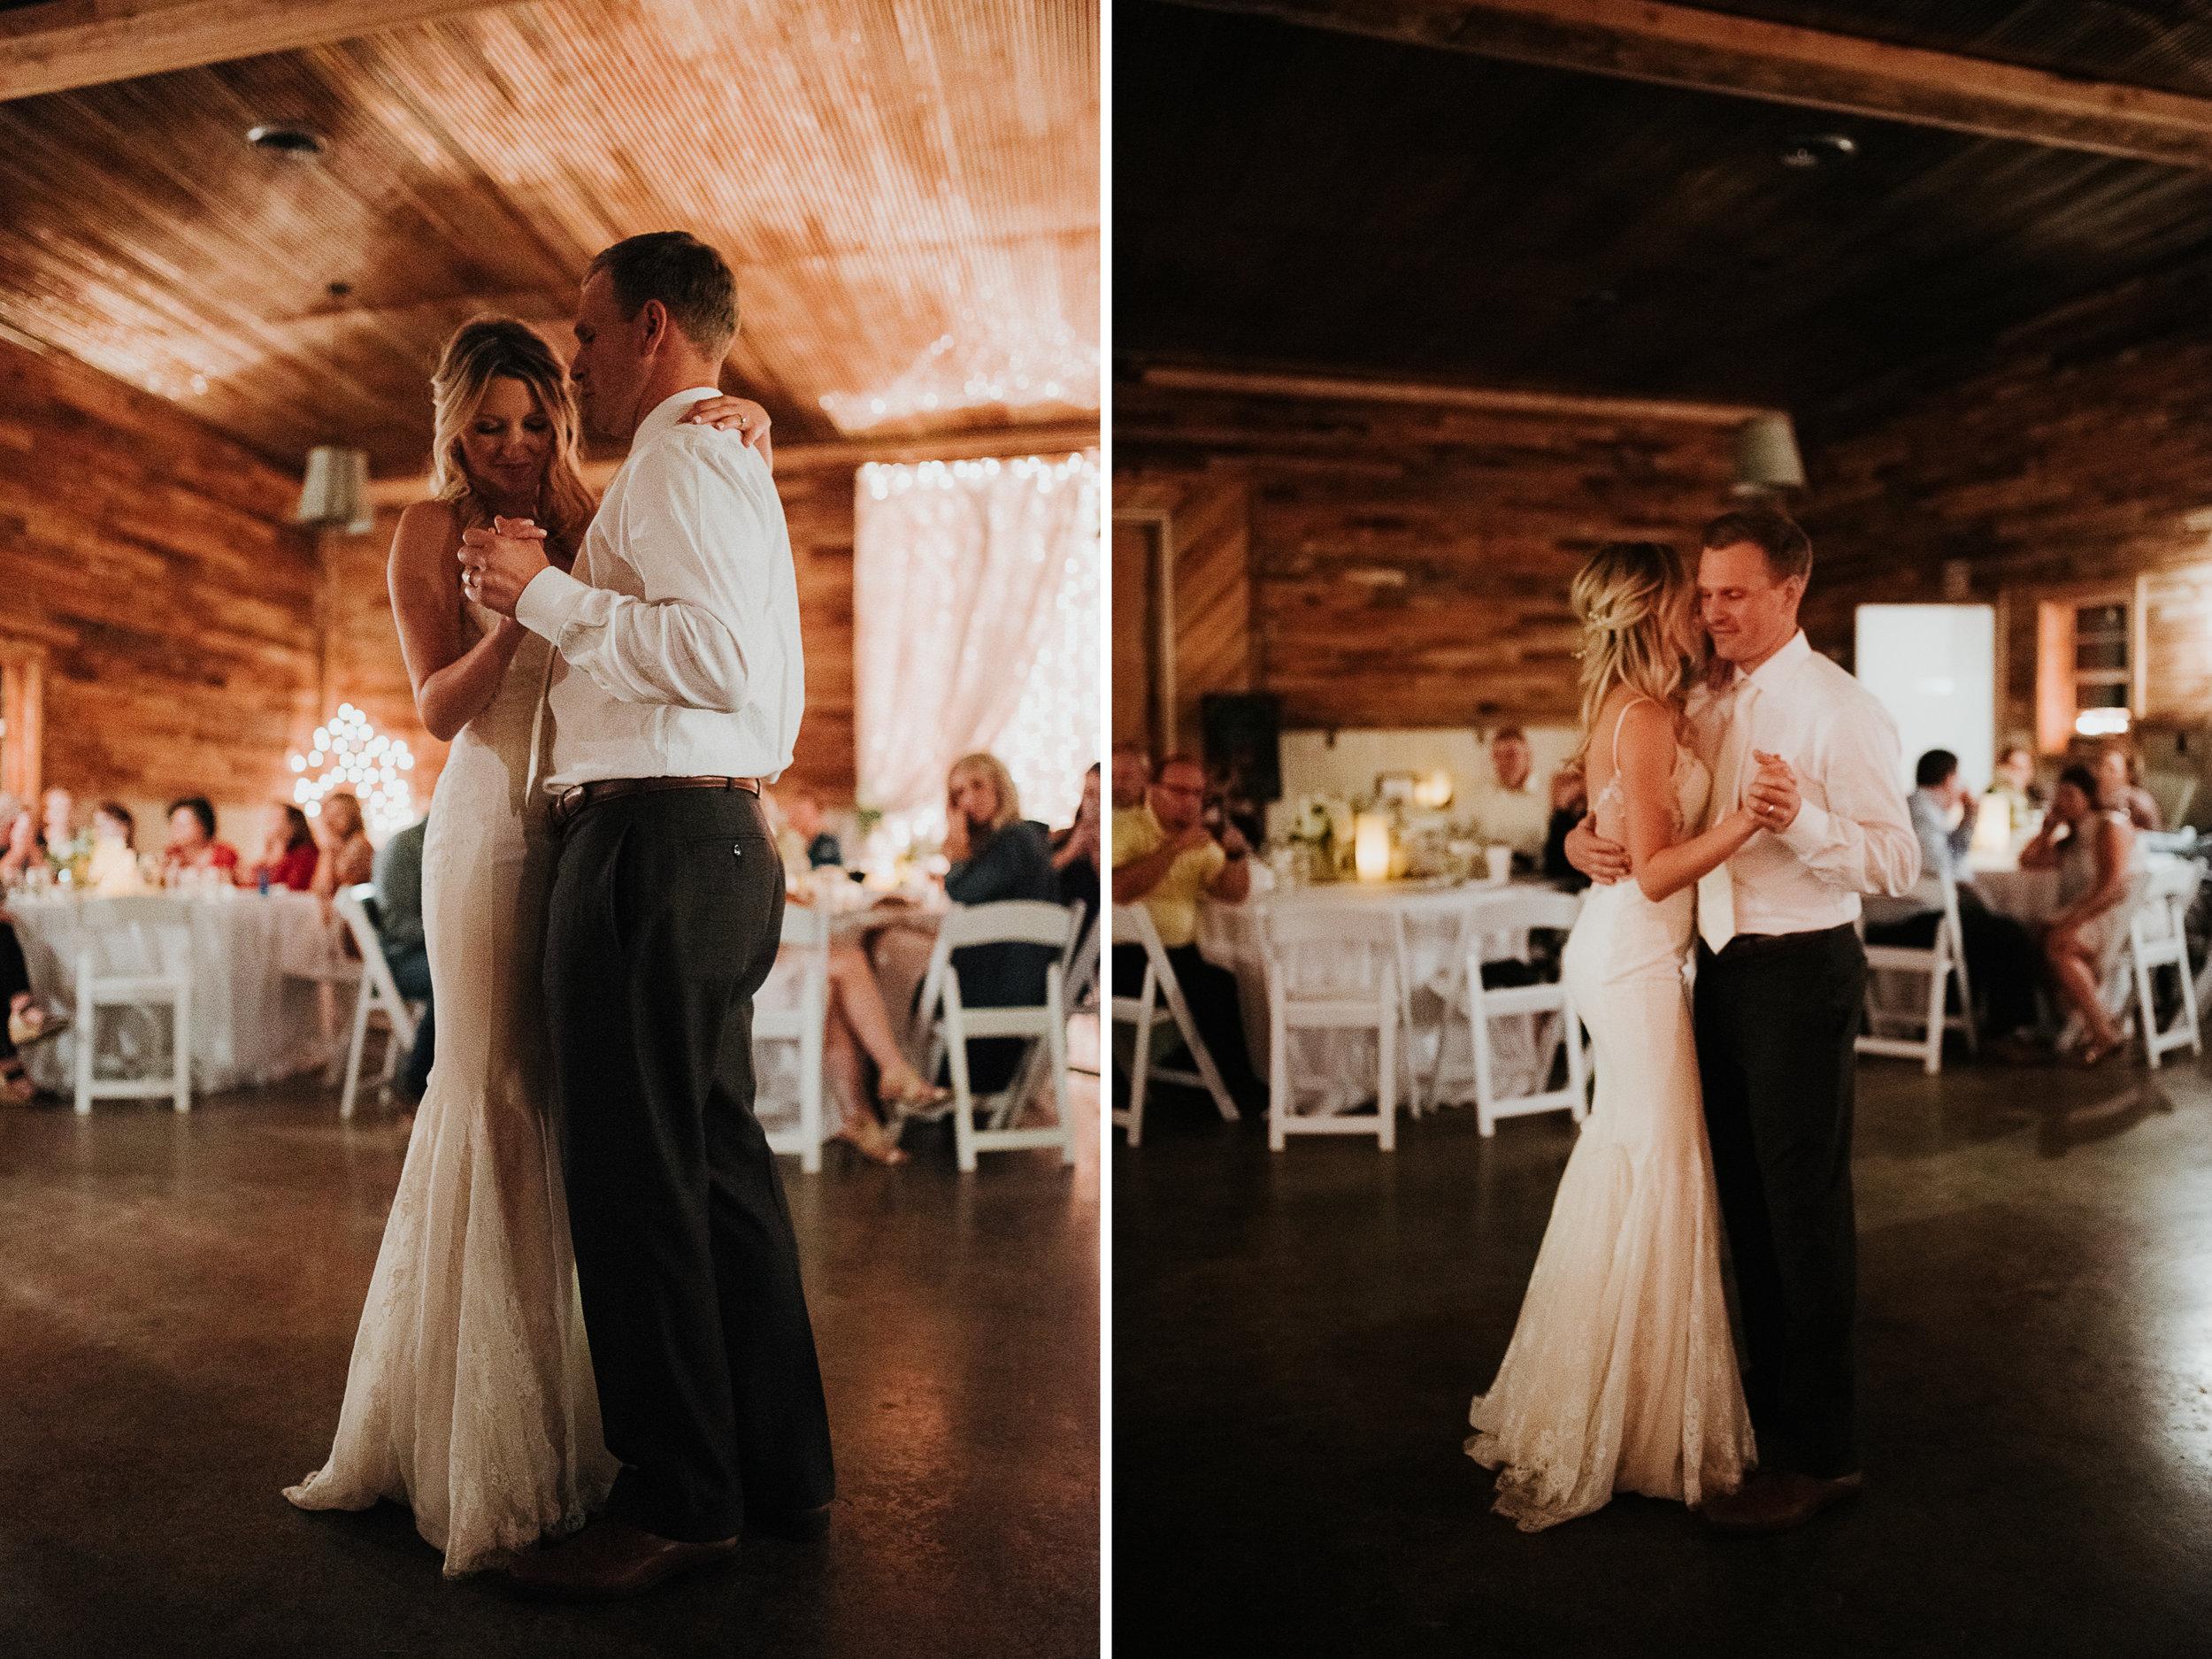 Zach&Rosalie St. Louis Wedding Photographer 13.jpg